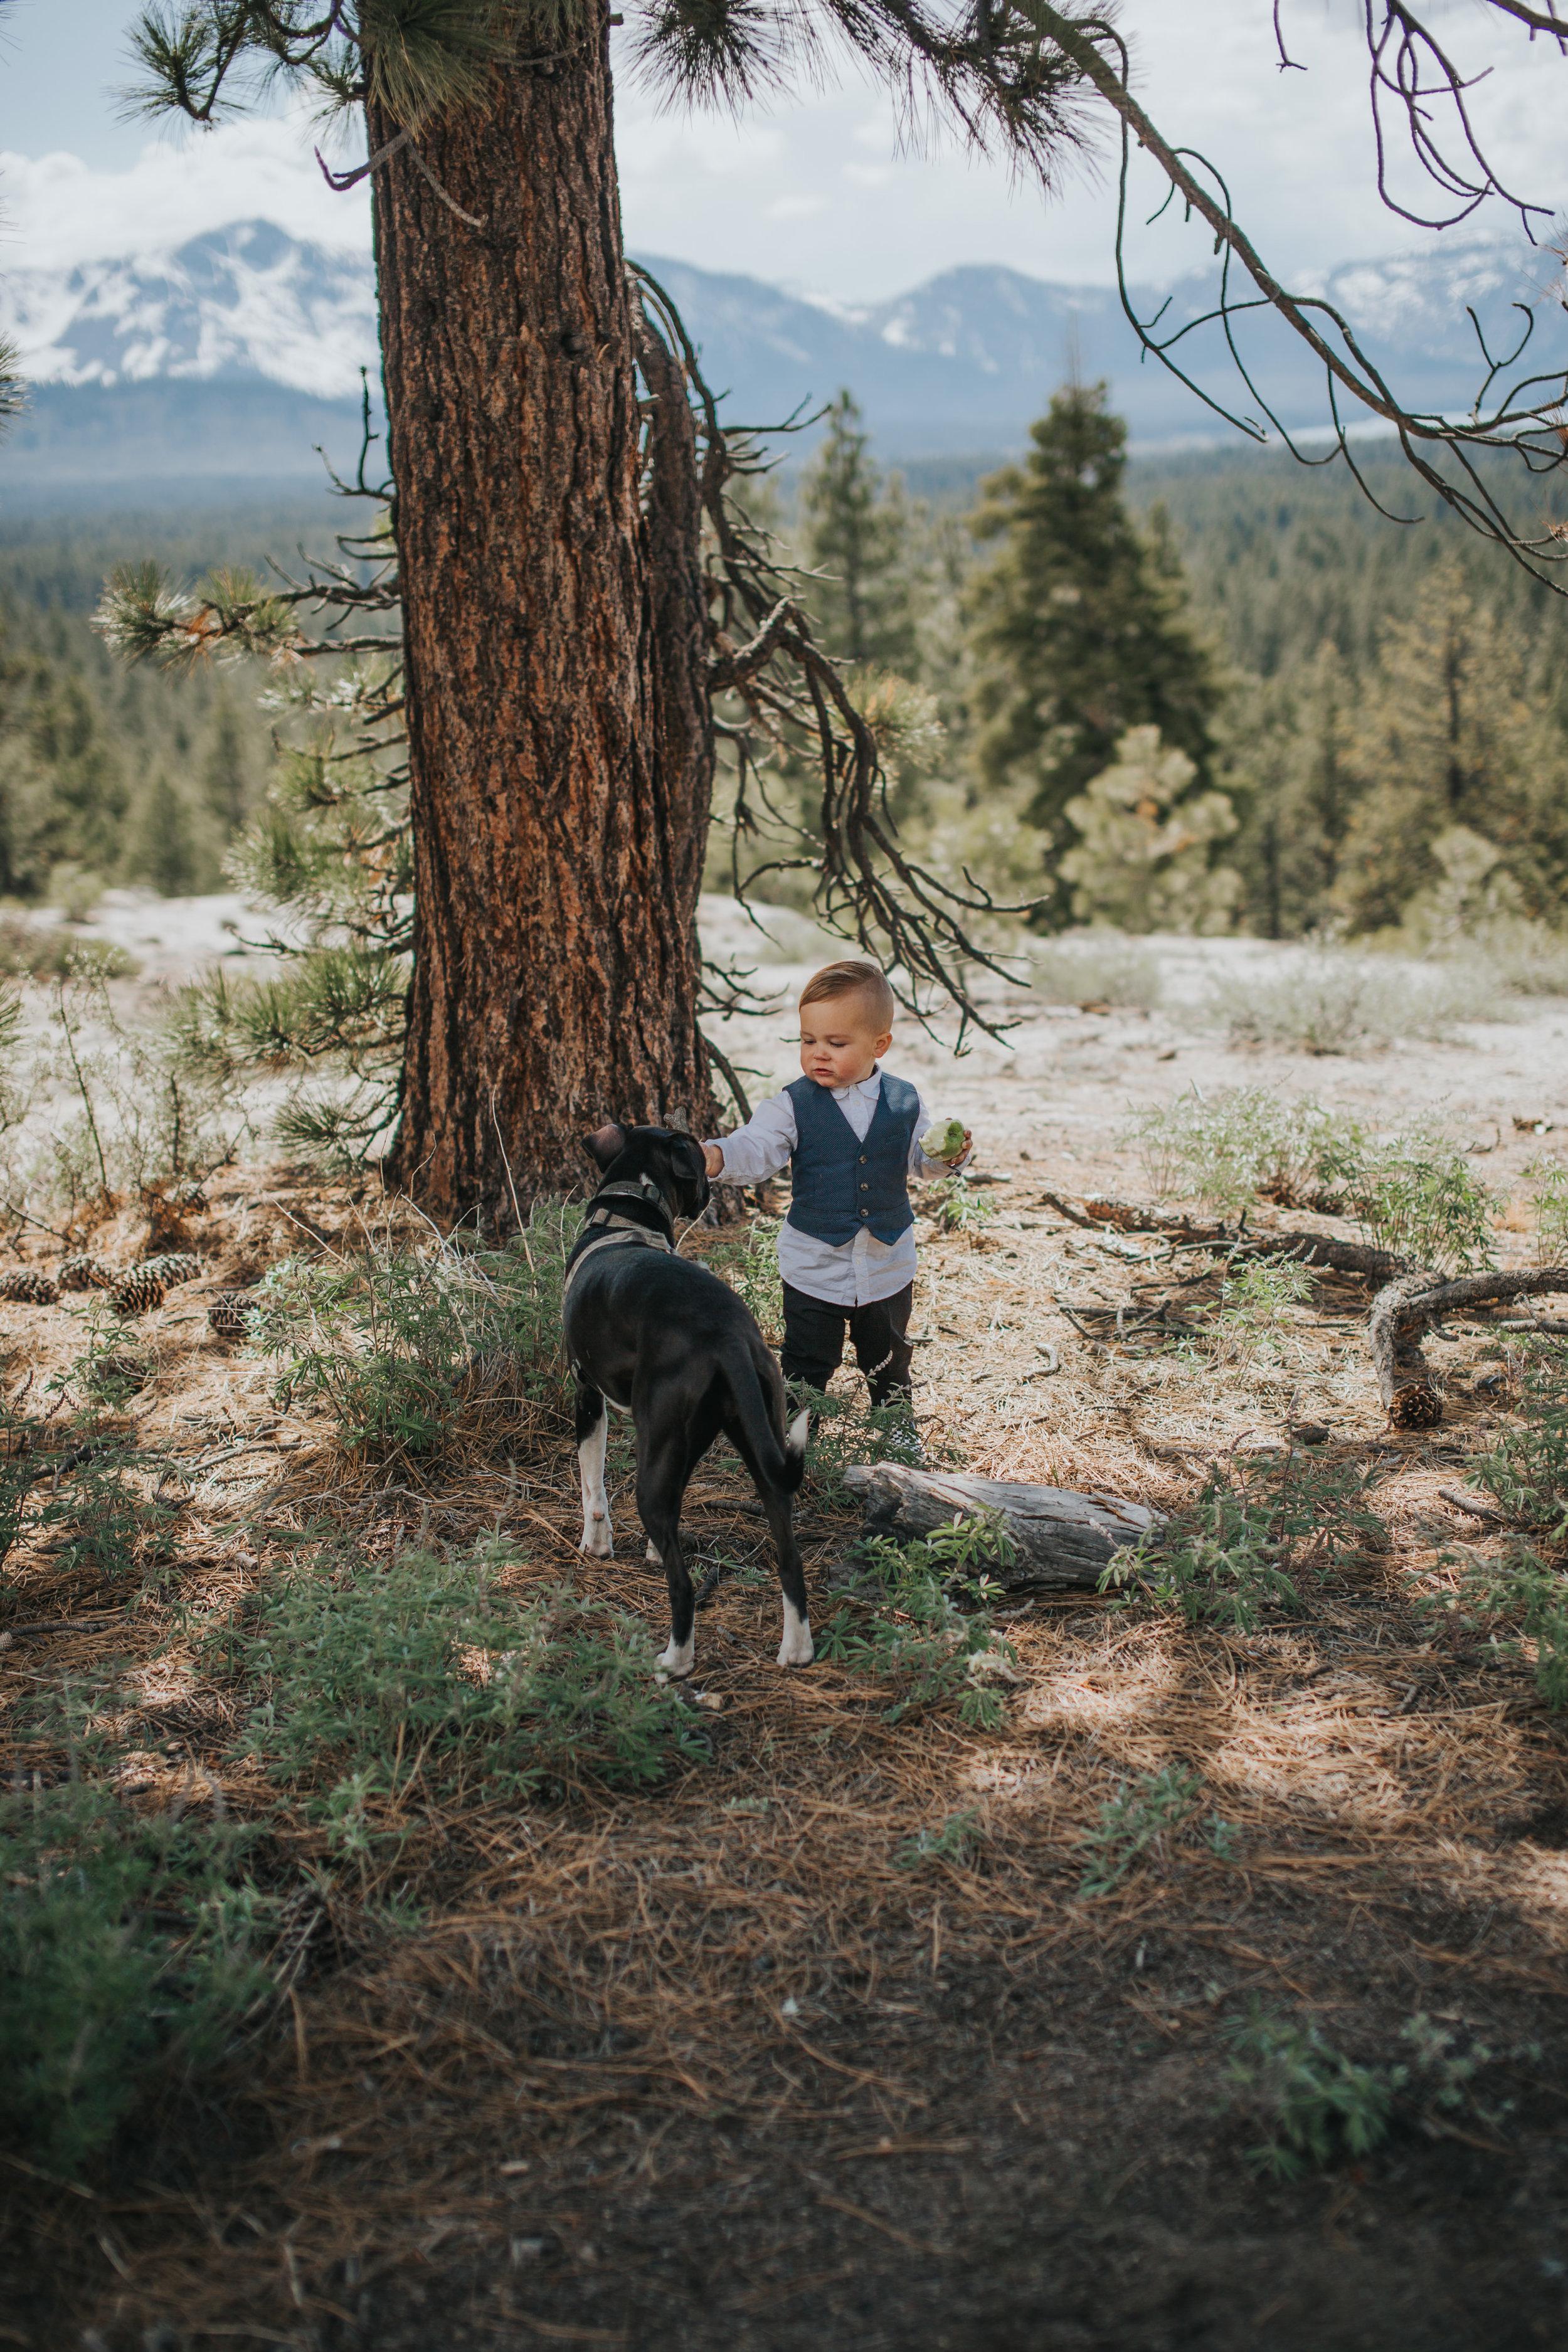 south-lake-tahoe-elopement-valerie-lendvay-photo-042.jpg